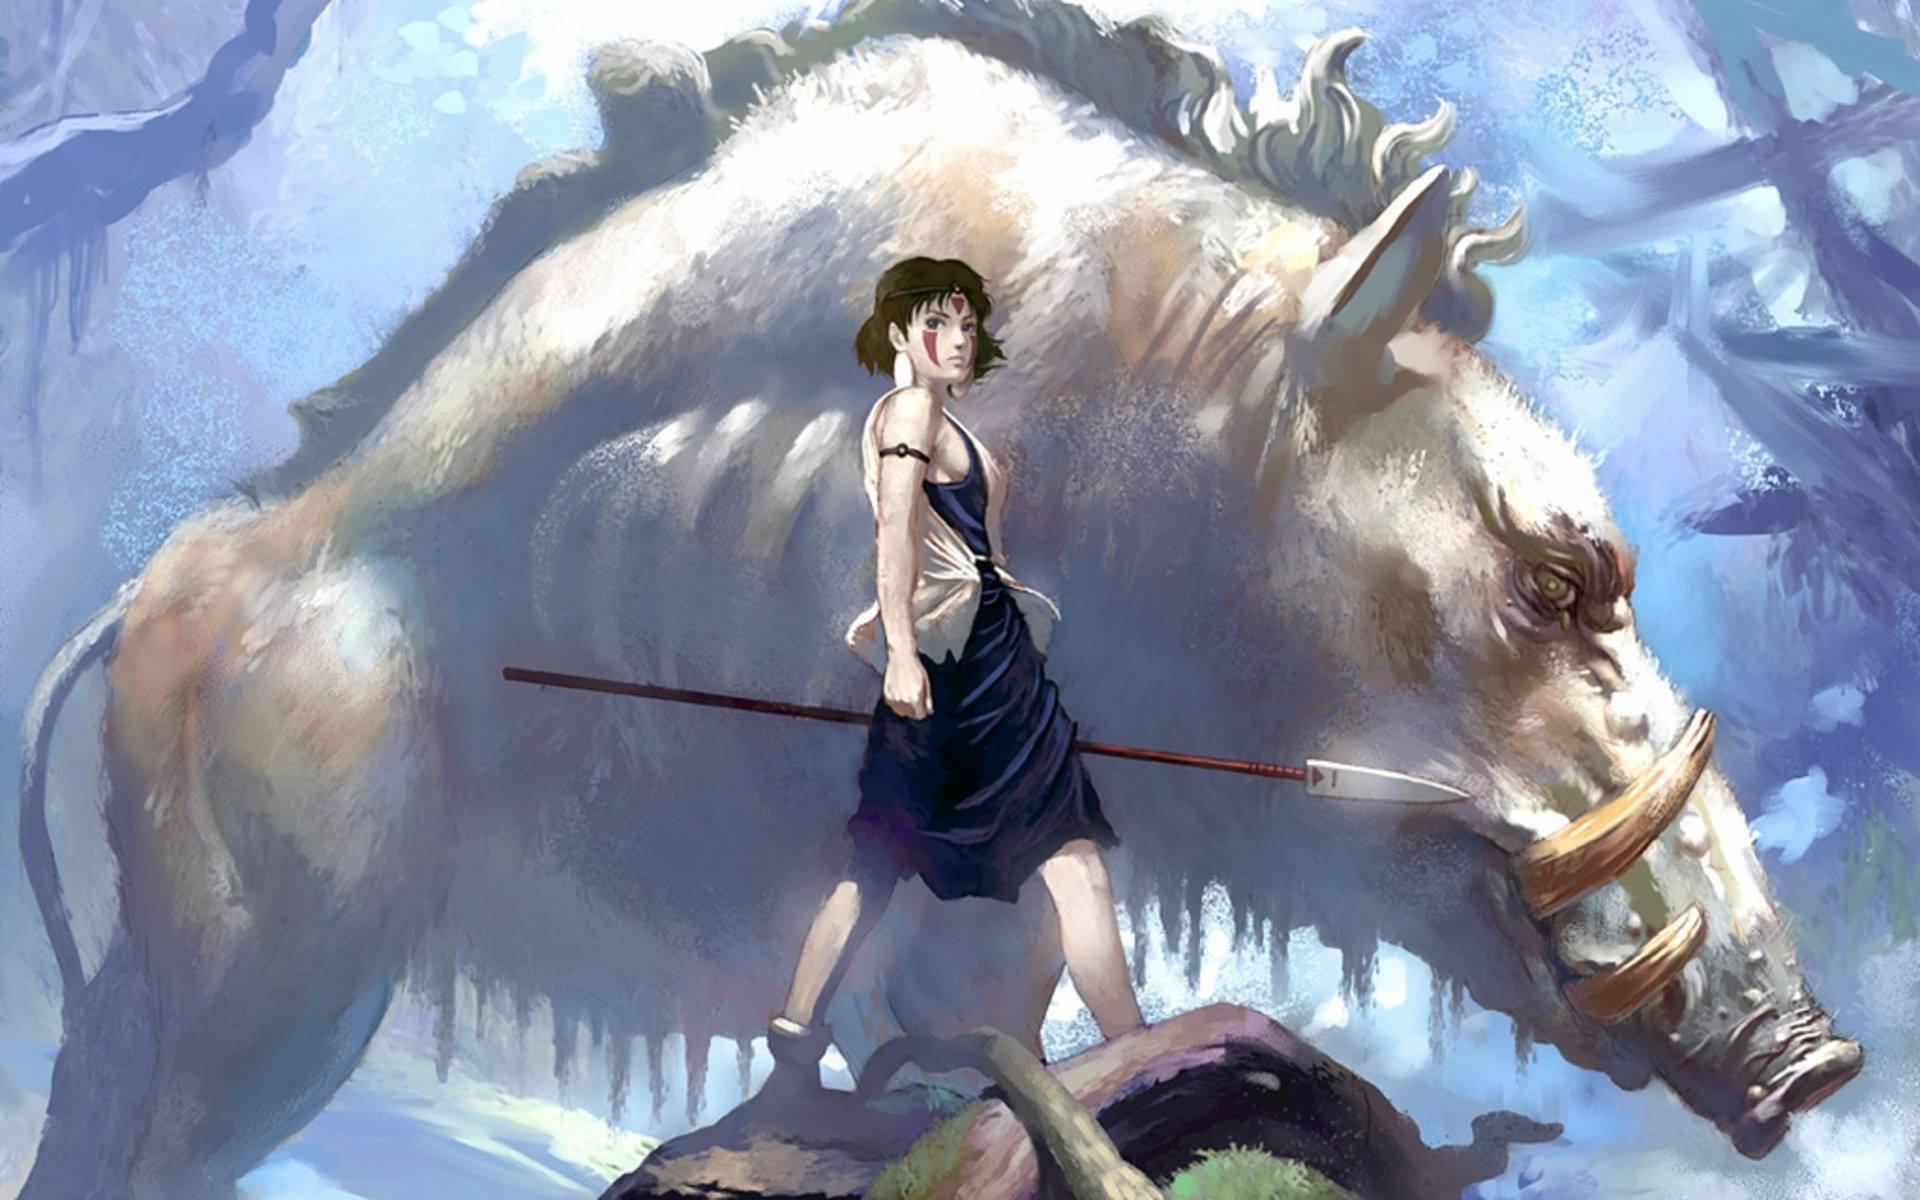 Princess Mononoke Wallpapers High Quality | Download Free